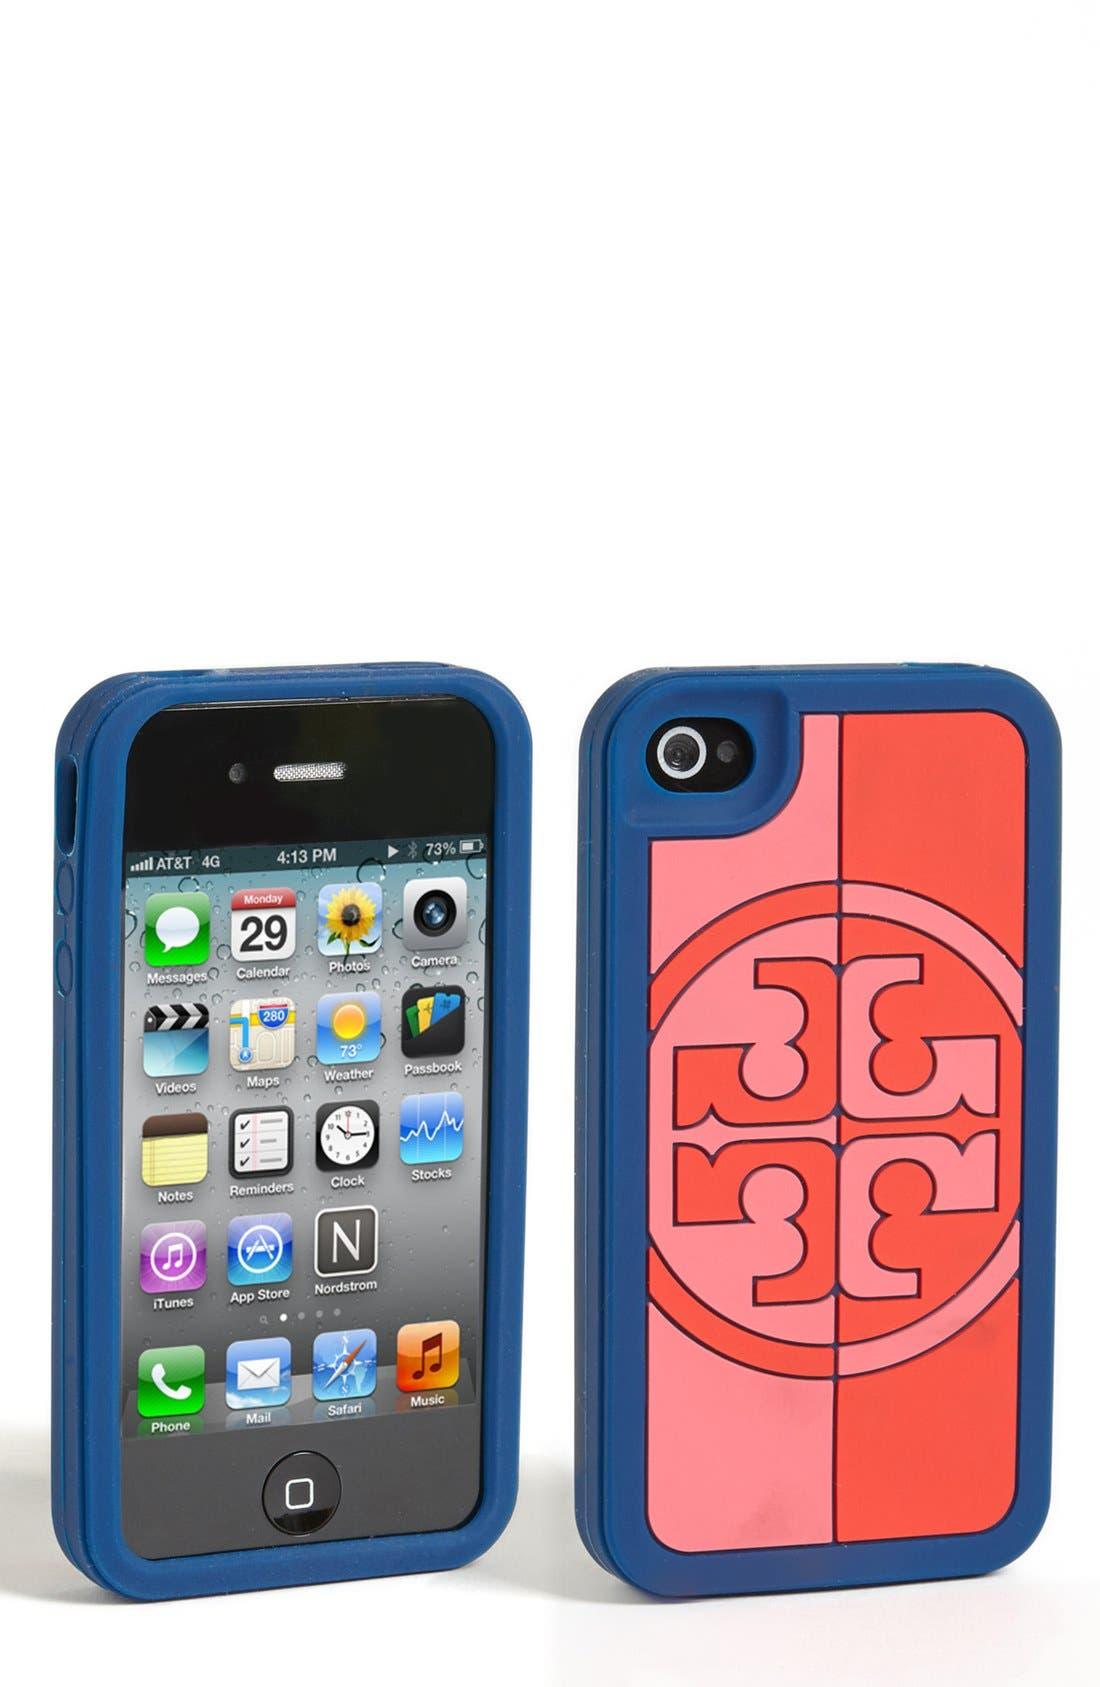 Alternate Image 1 Selected - Tory Burch 'Reva' iPhone 4 & 4S Case